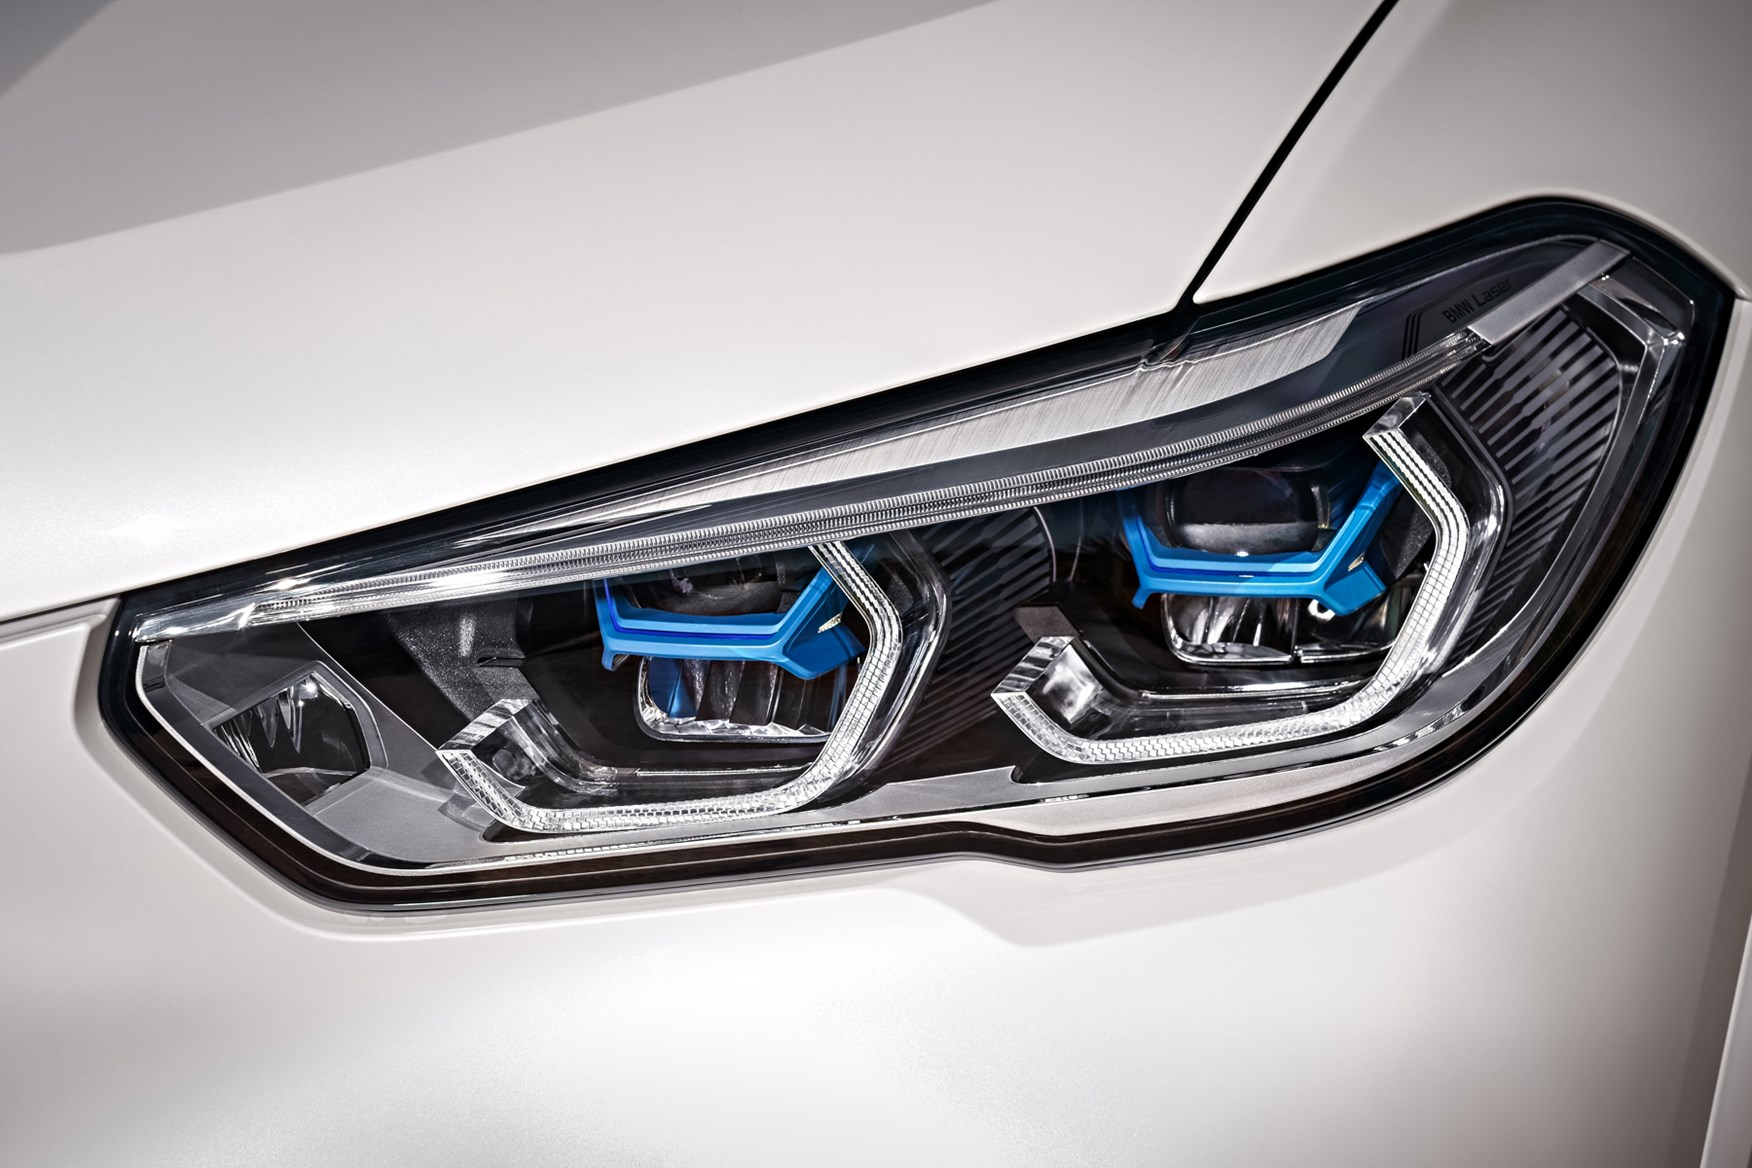 LED headlights on the 2018 BMW X5